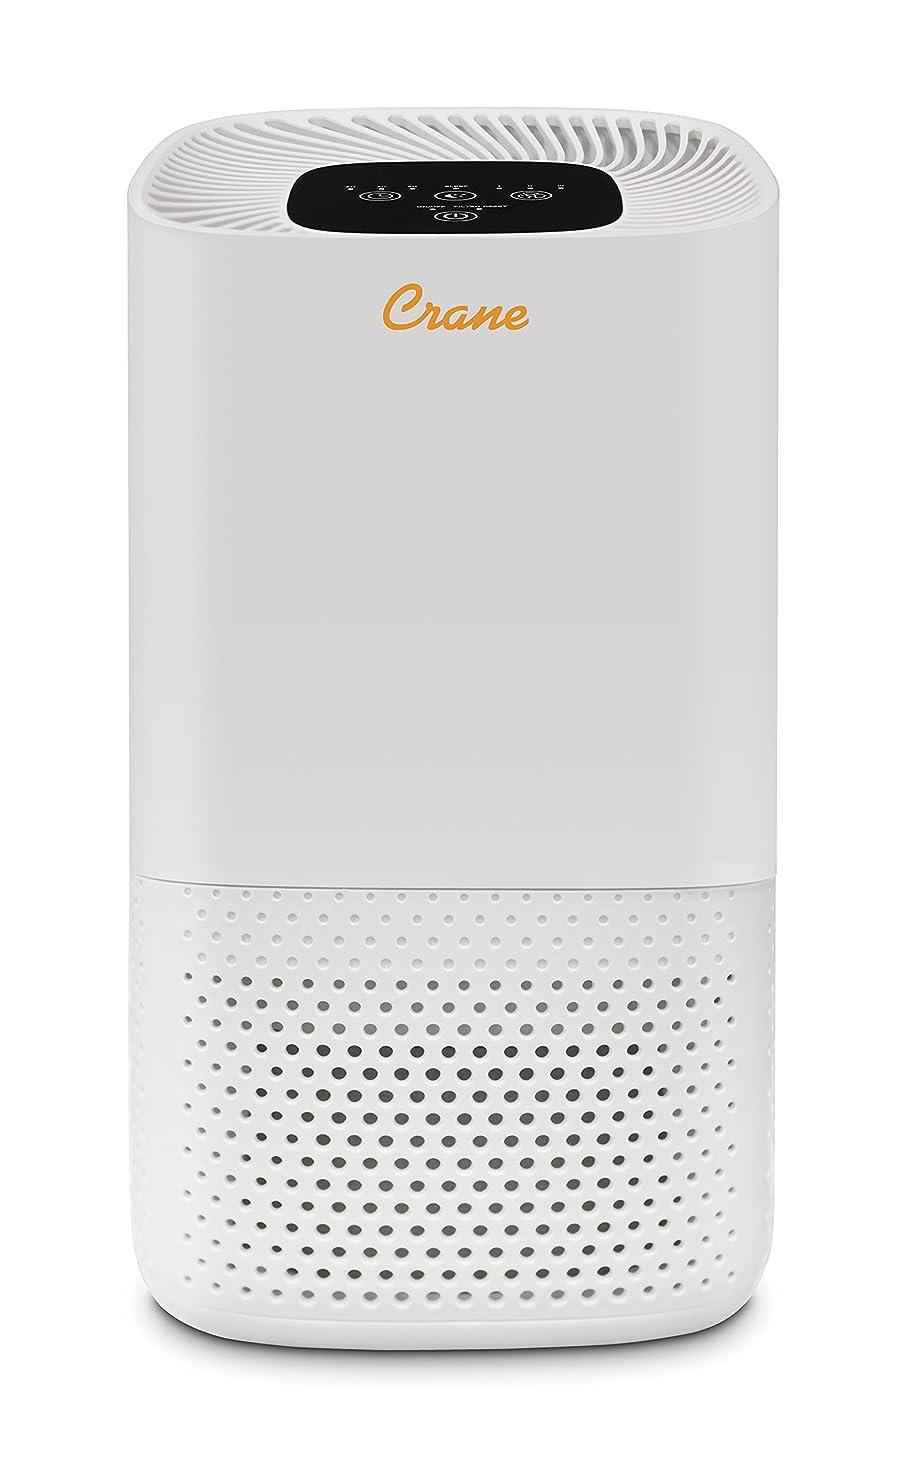 Crane Tower Air Purifier with True HEPA Filter, Standard, White